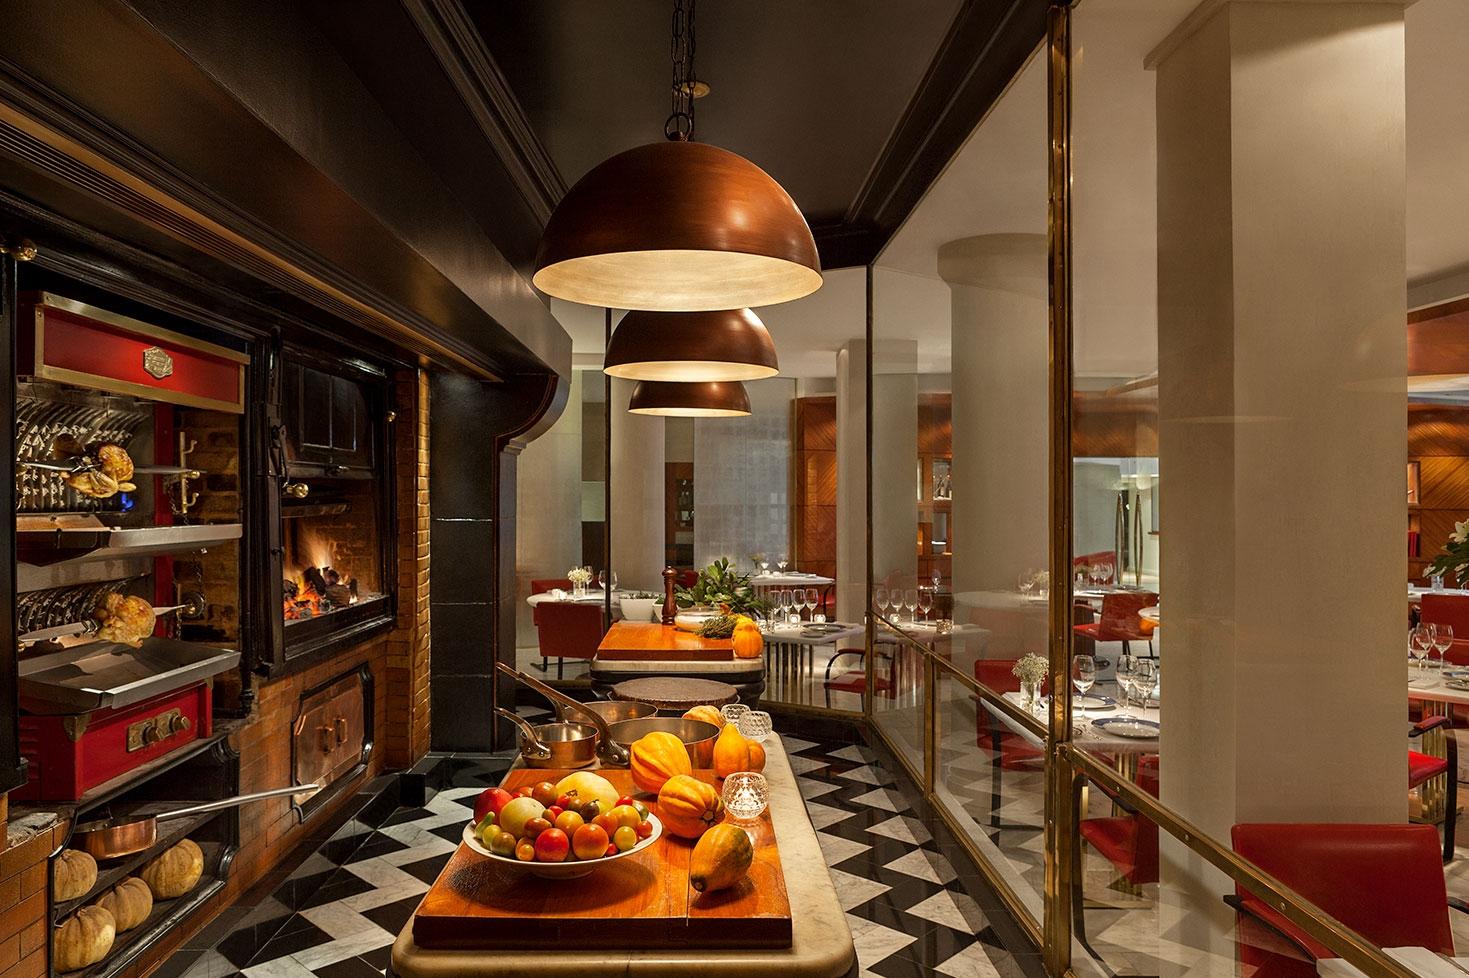 grill-la-bourgogne--galerias-website-2.jpg